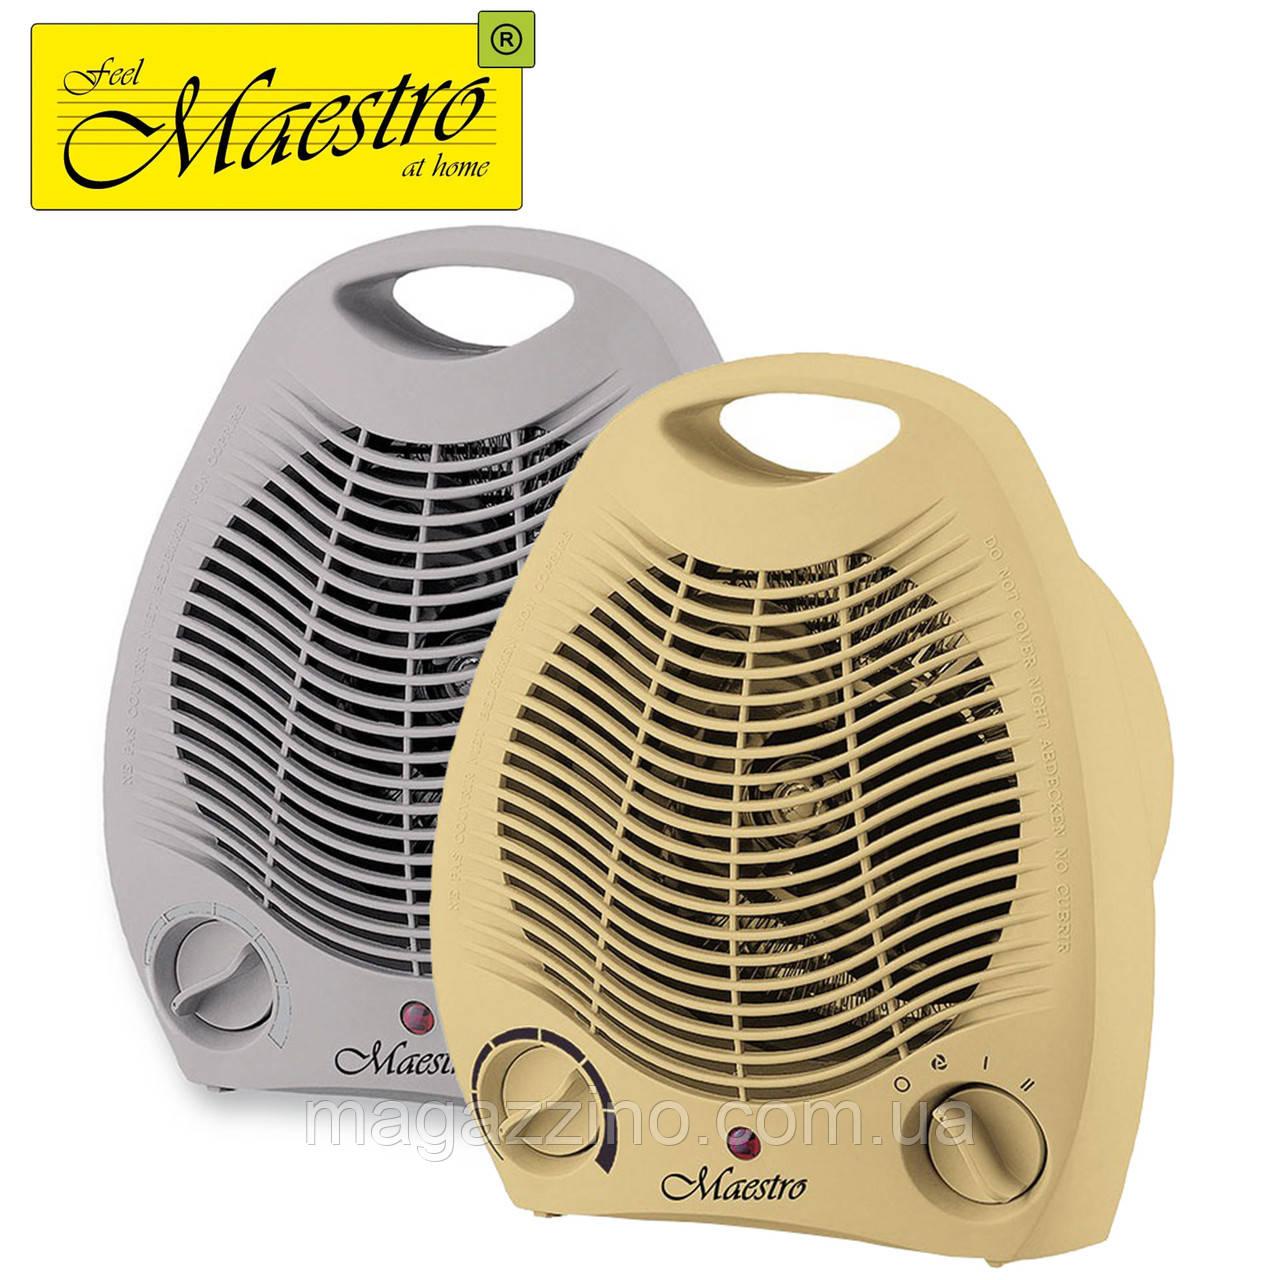 Тепловентилятор Maestro MR-920, 2000 Вт.